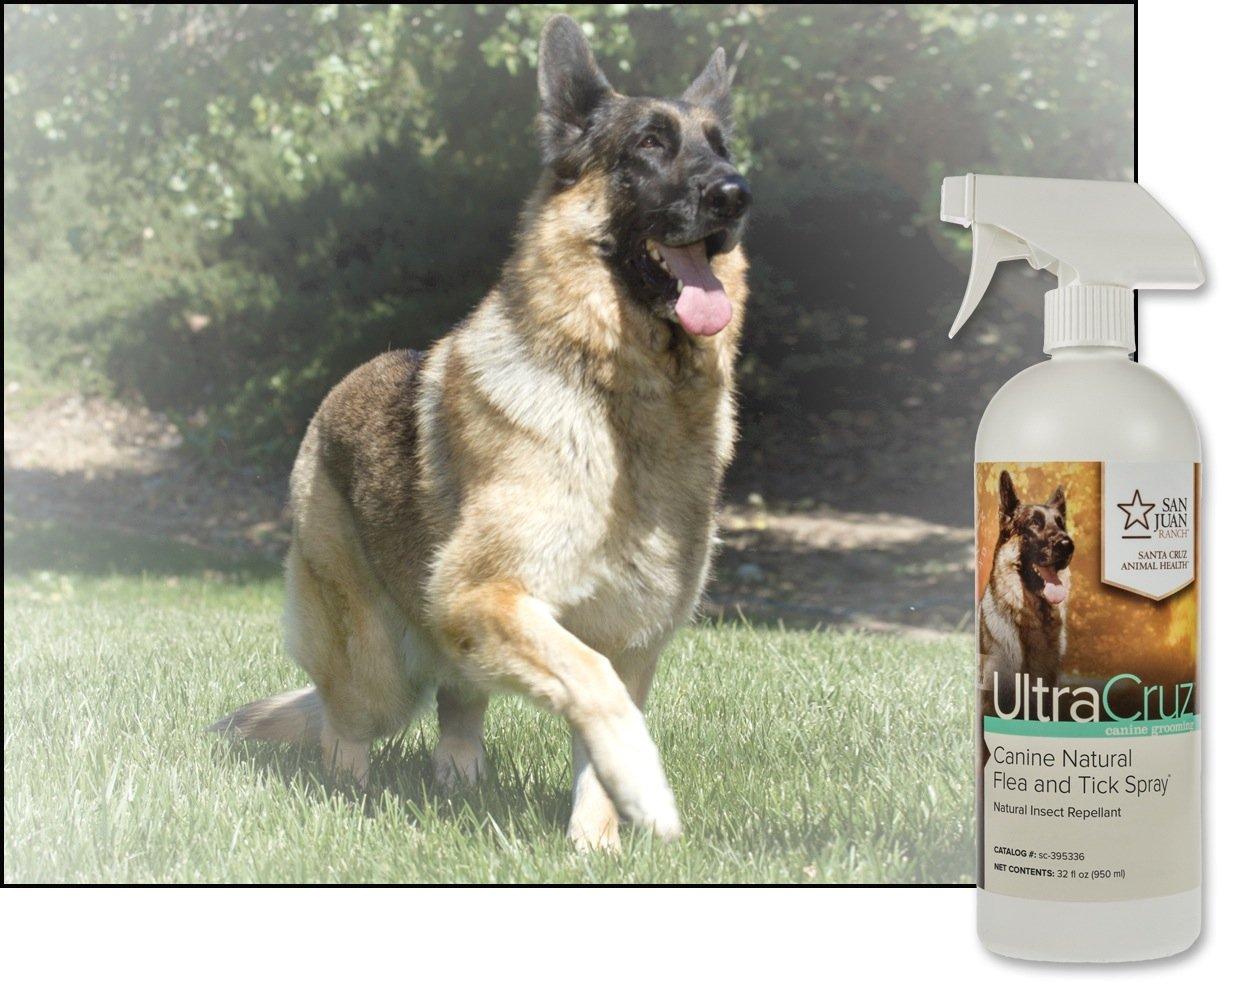 UltraCruz Canine Natural Flea and Tick Spray for Horses, 32 oz. by UltraCruz (Image #4)